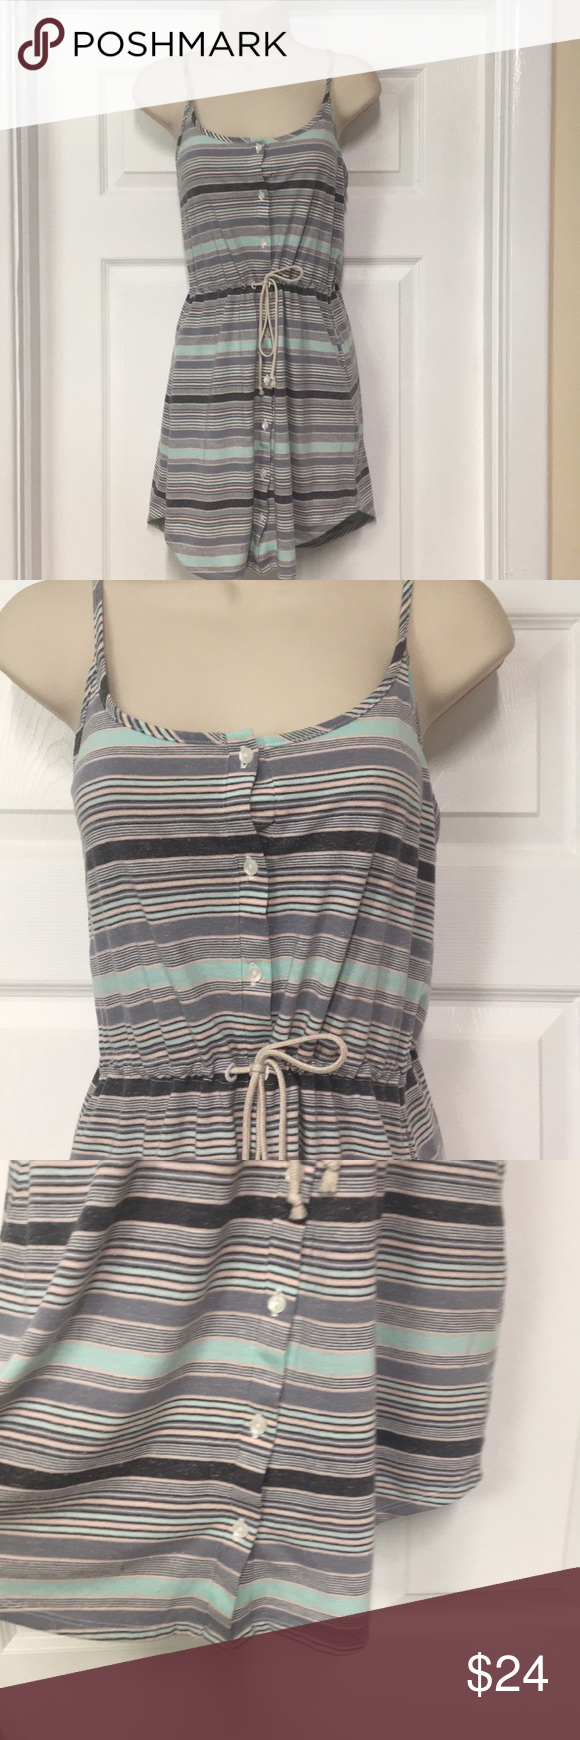 Victoria S Secret Striped Summer Dress Striped Dress Summer Summer Dresses Clothes Design [ 1740 x 580 Pixel ]